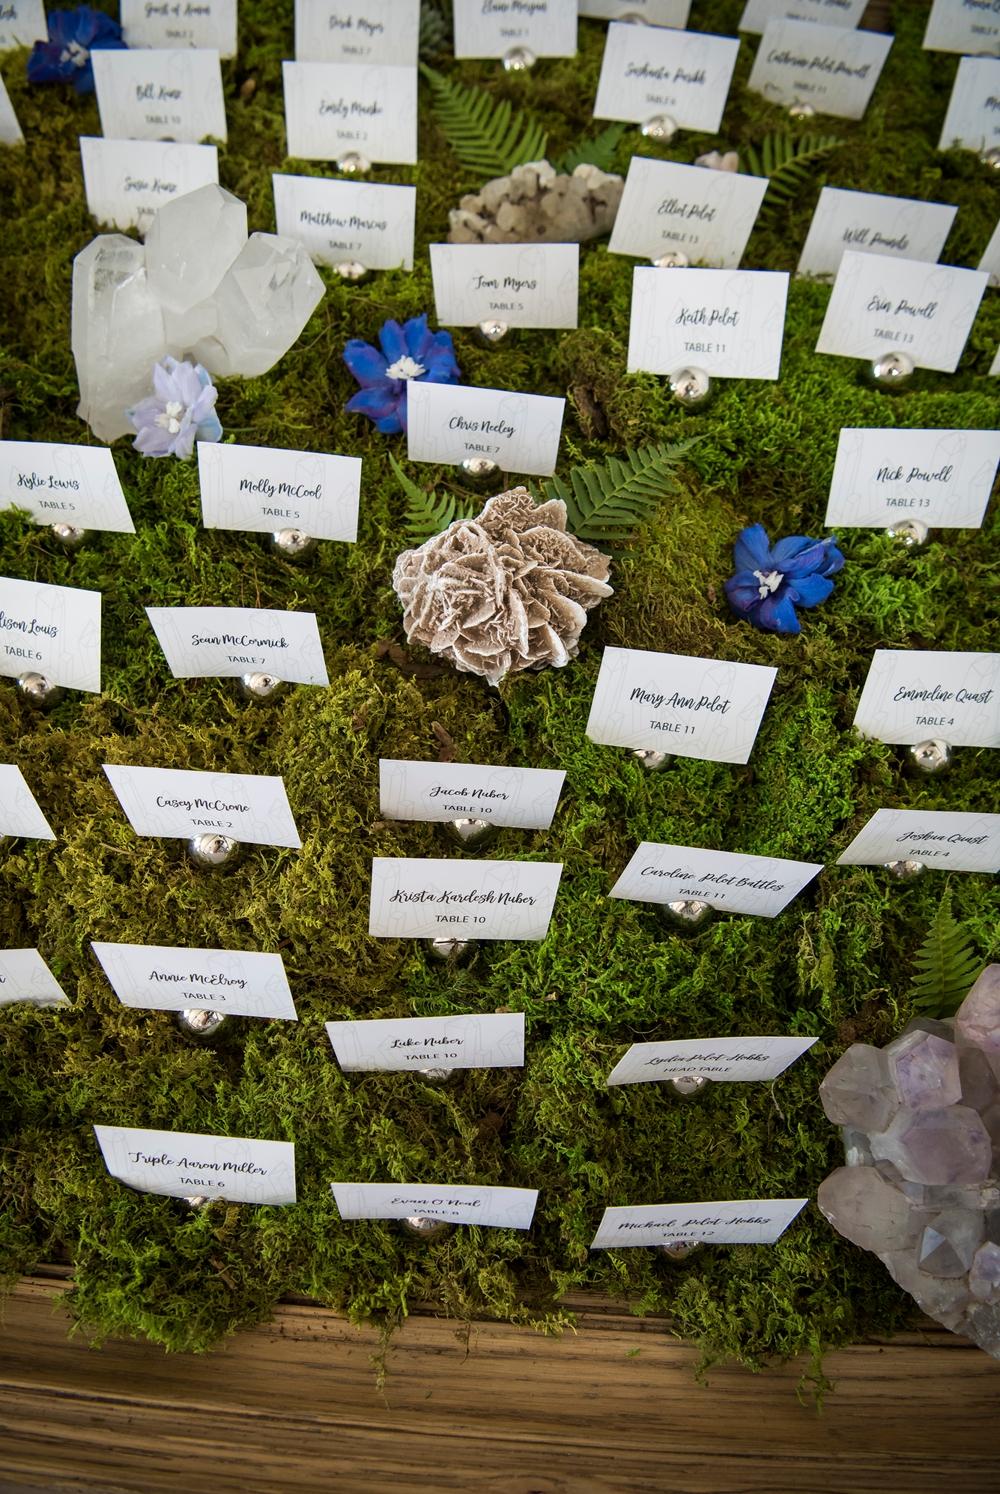 PNW-ferns-at-fremont-foundry-wedding-florist 24.jpg